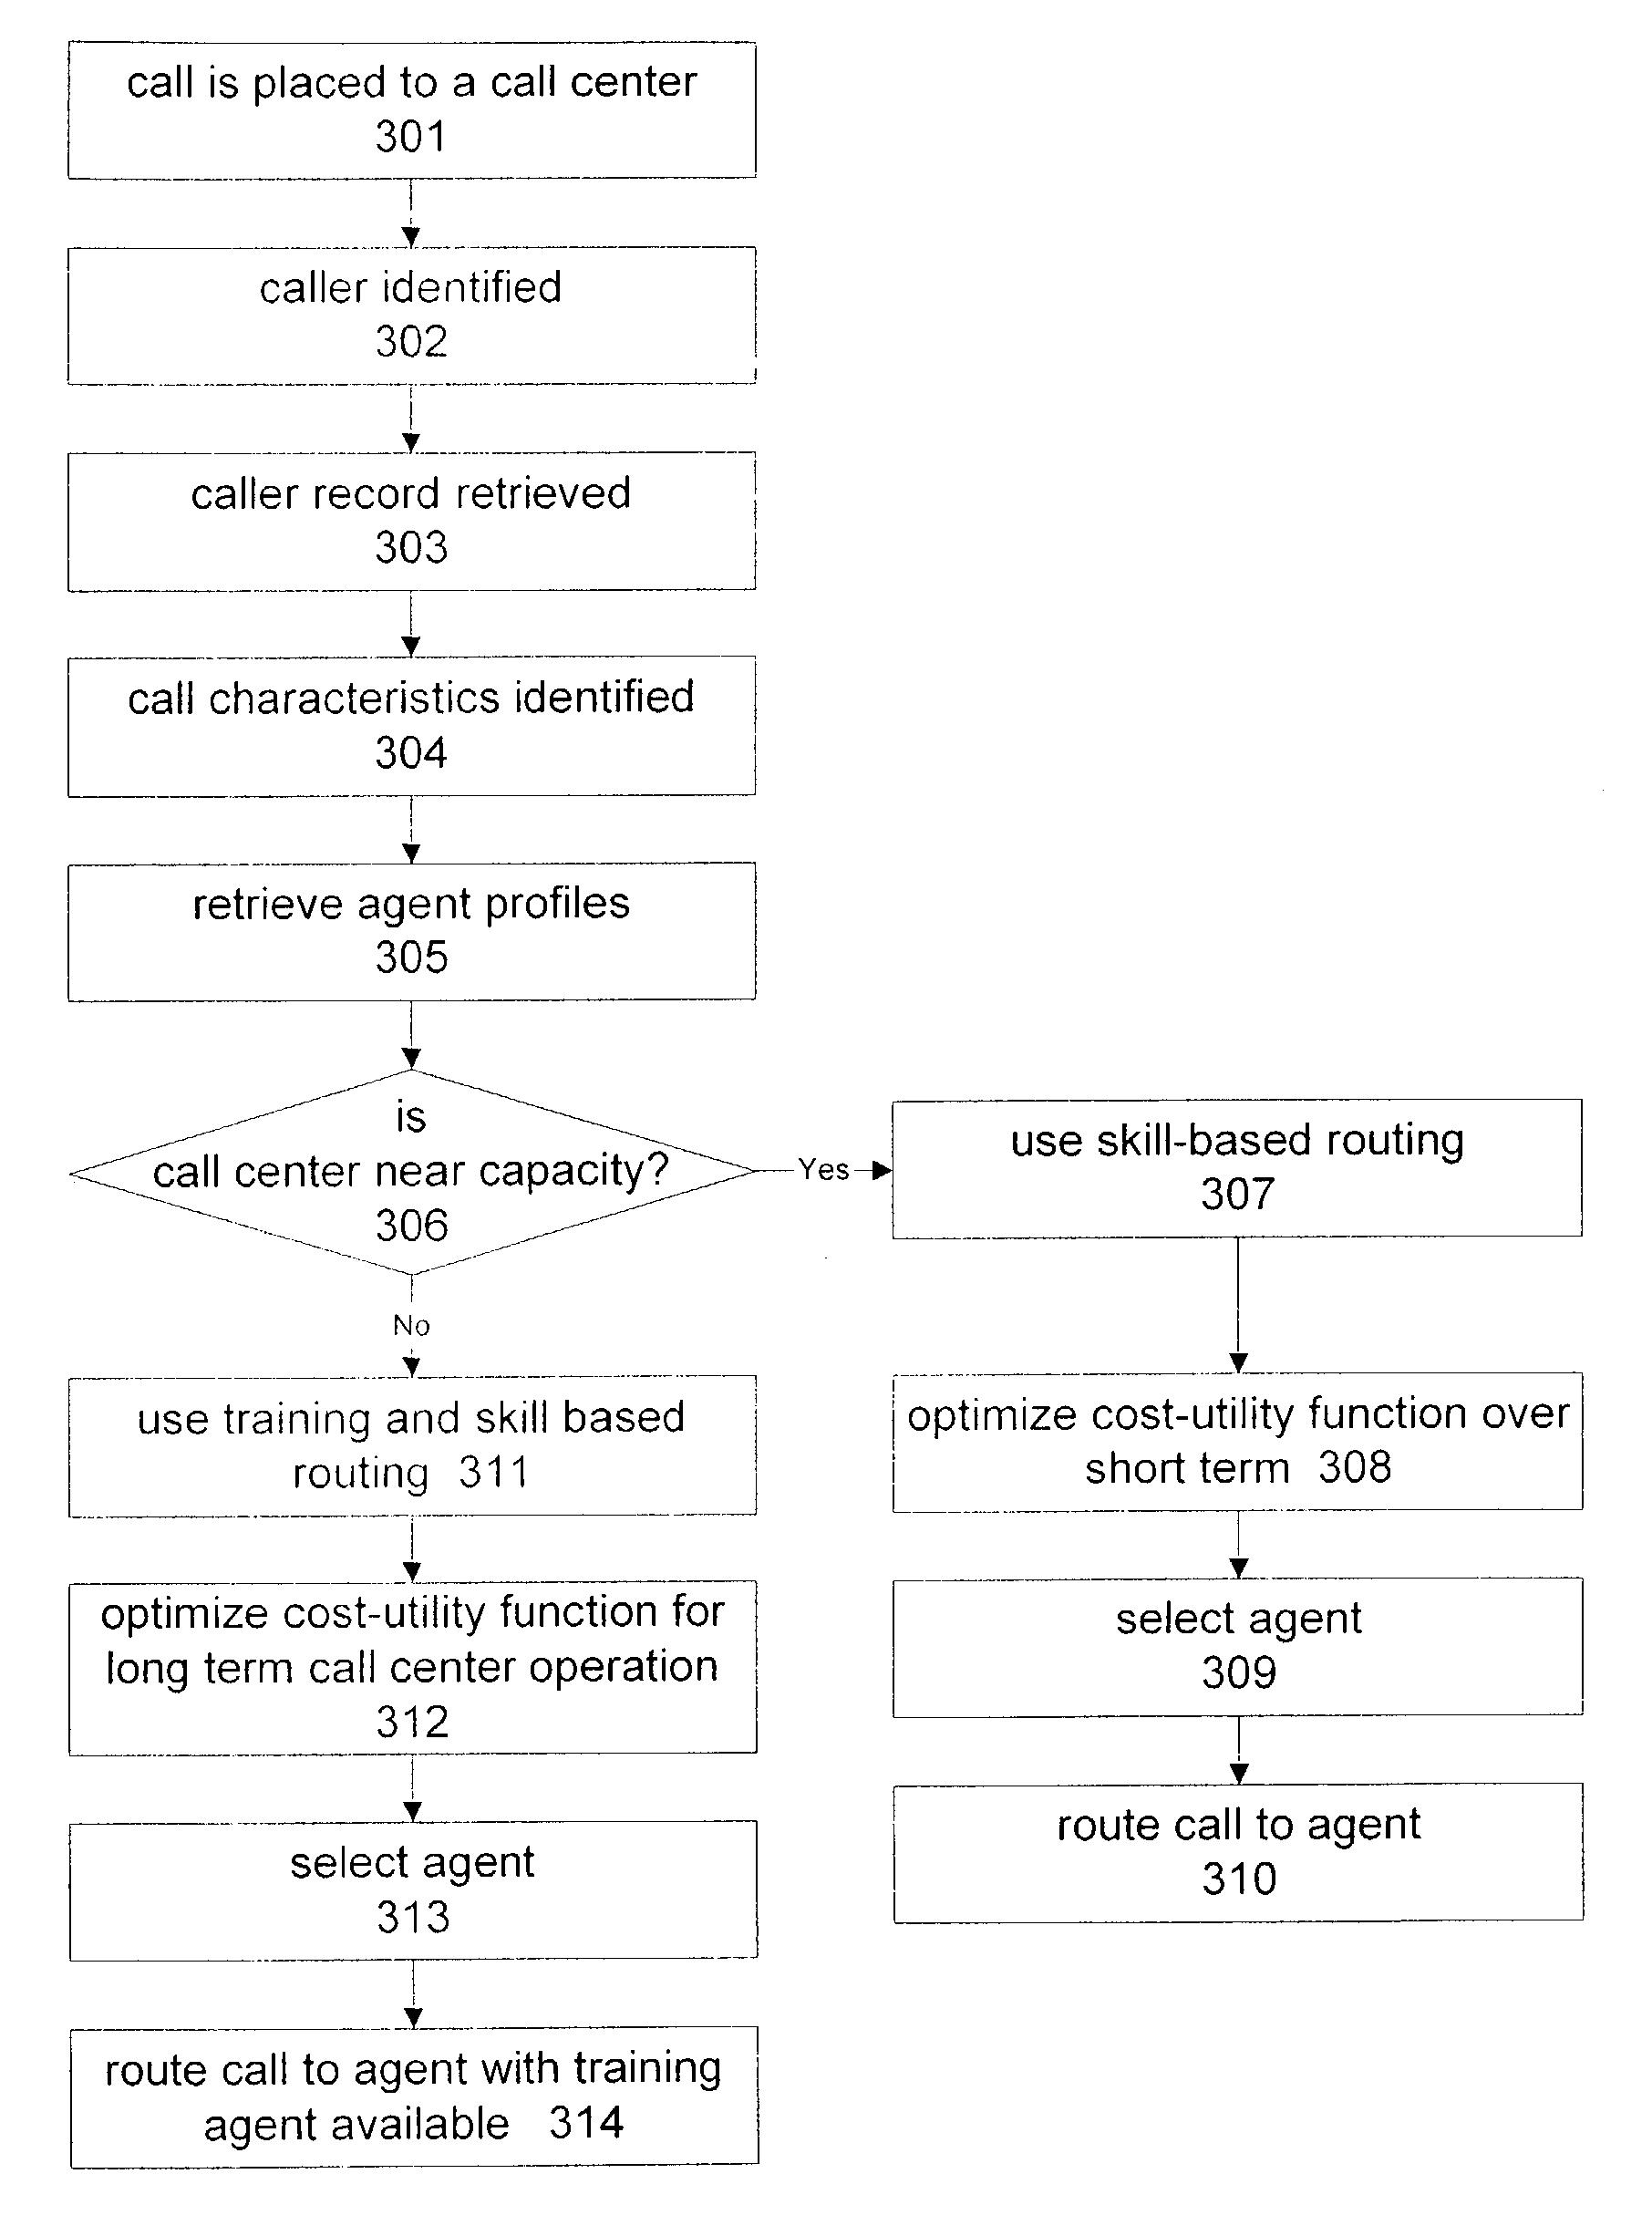 Patent US 7,023,979 B1